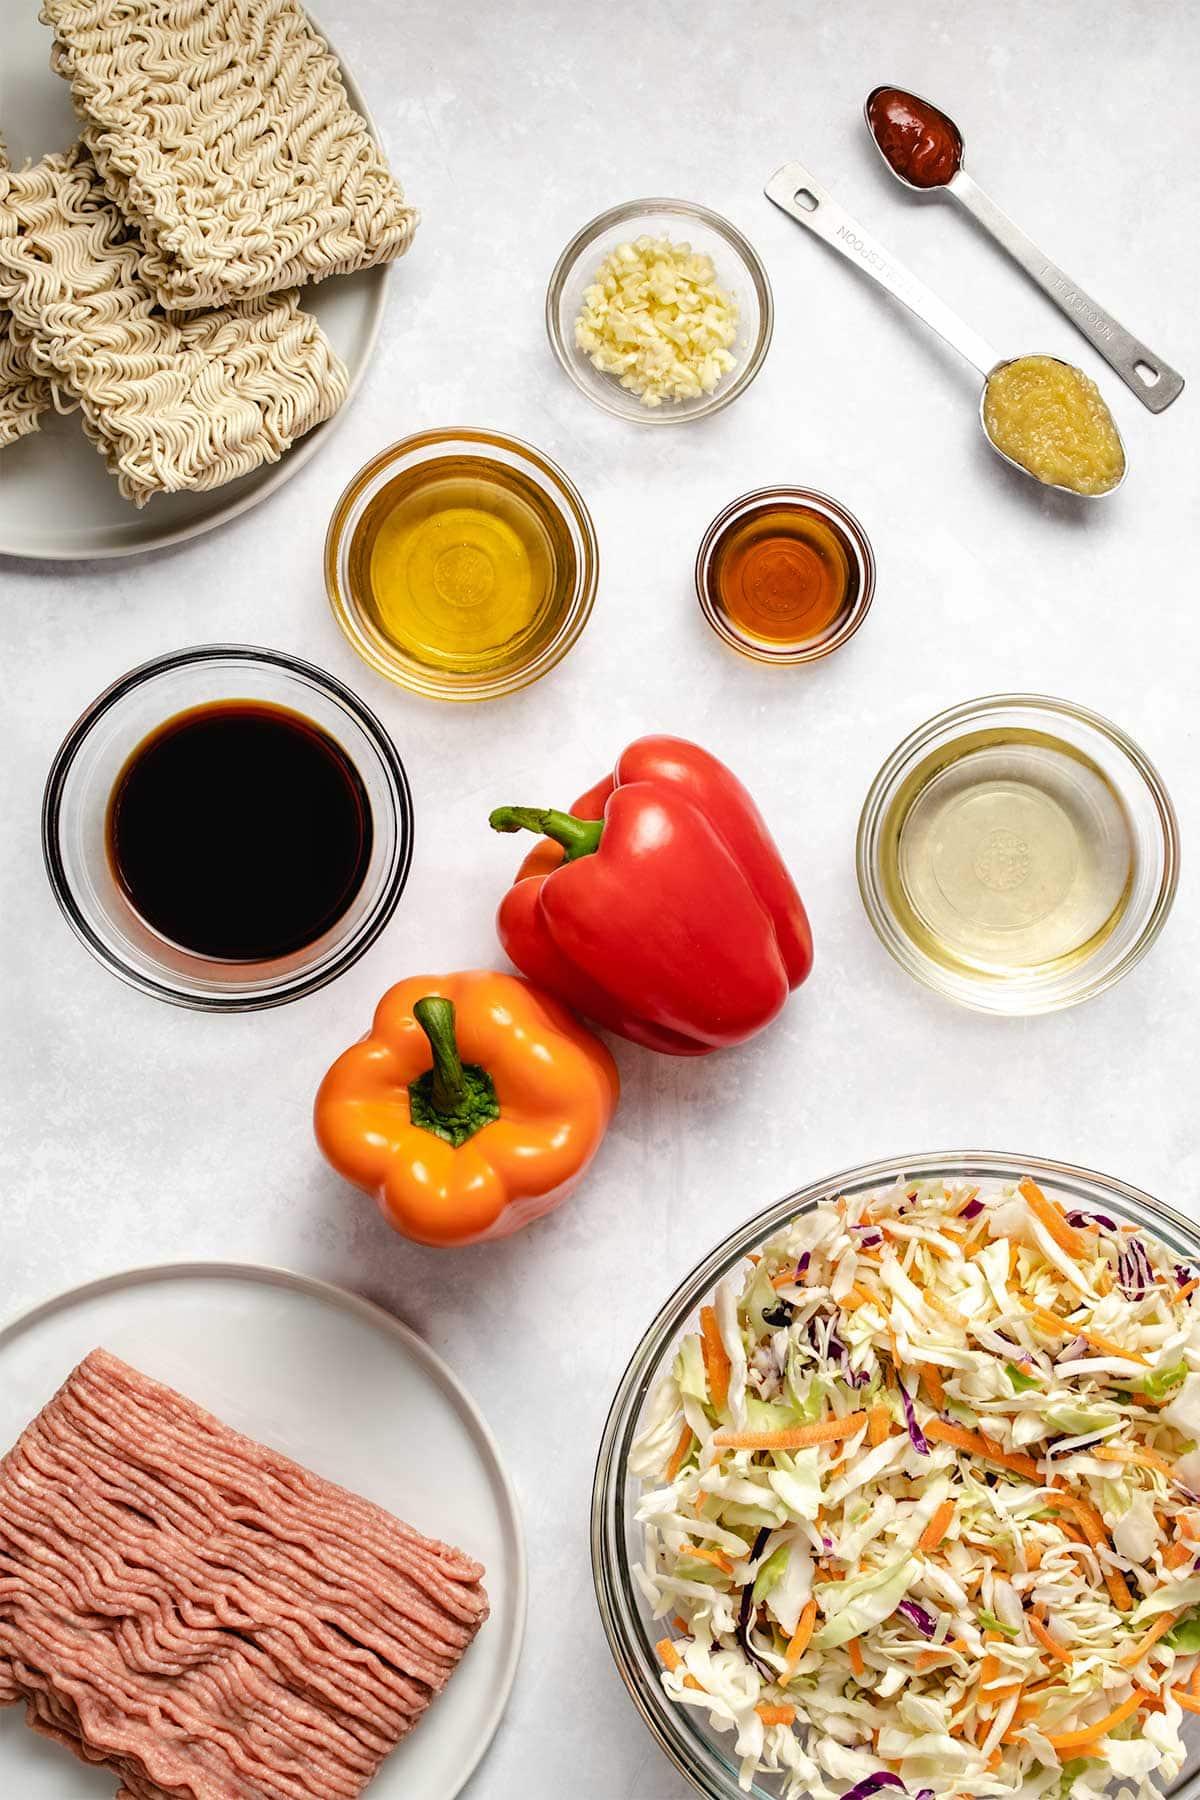 Ingredients needed to make Chicken Ramen Stir Fry viewed from overhead.